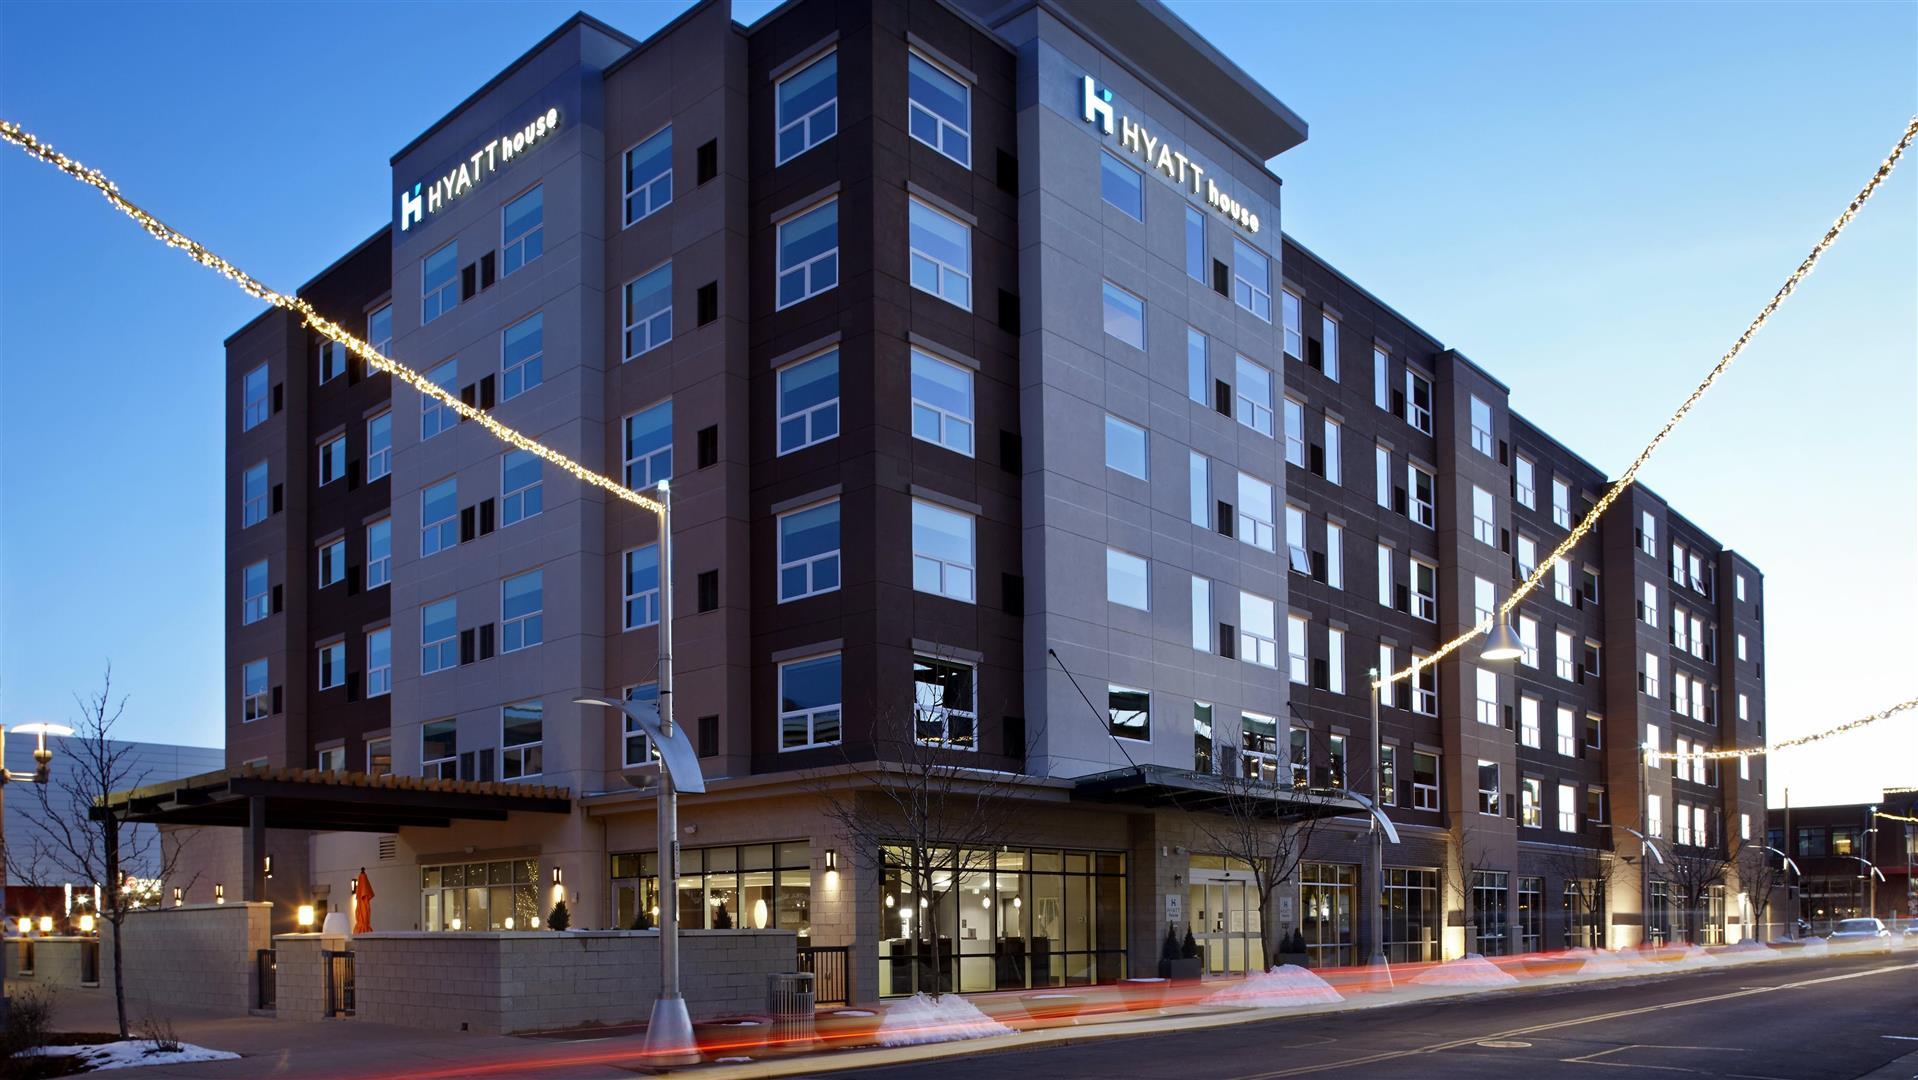 Meetings and Events at Hyatt House Denver/Lakewood at Belmar, Denver ...